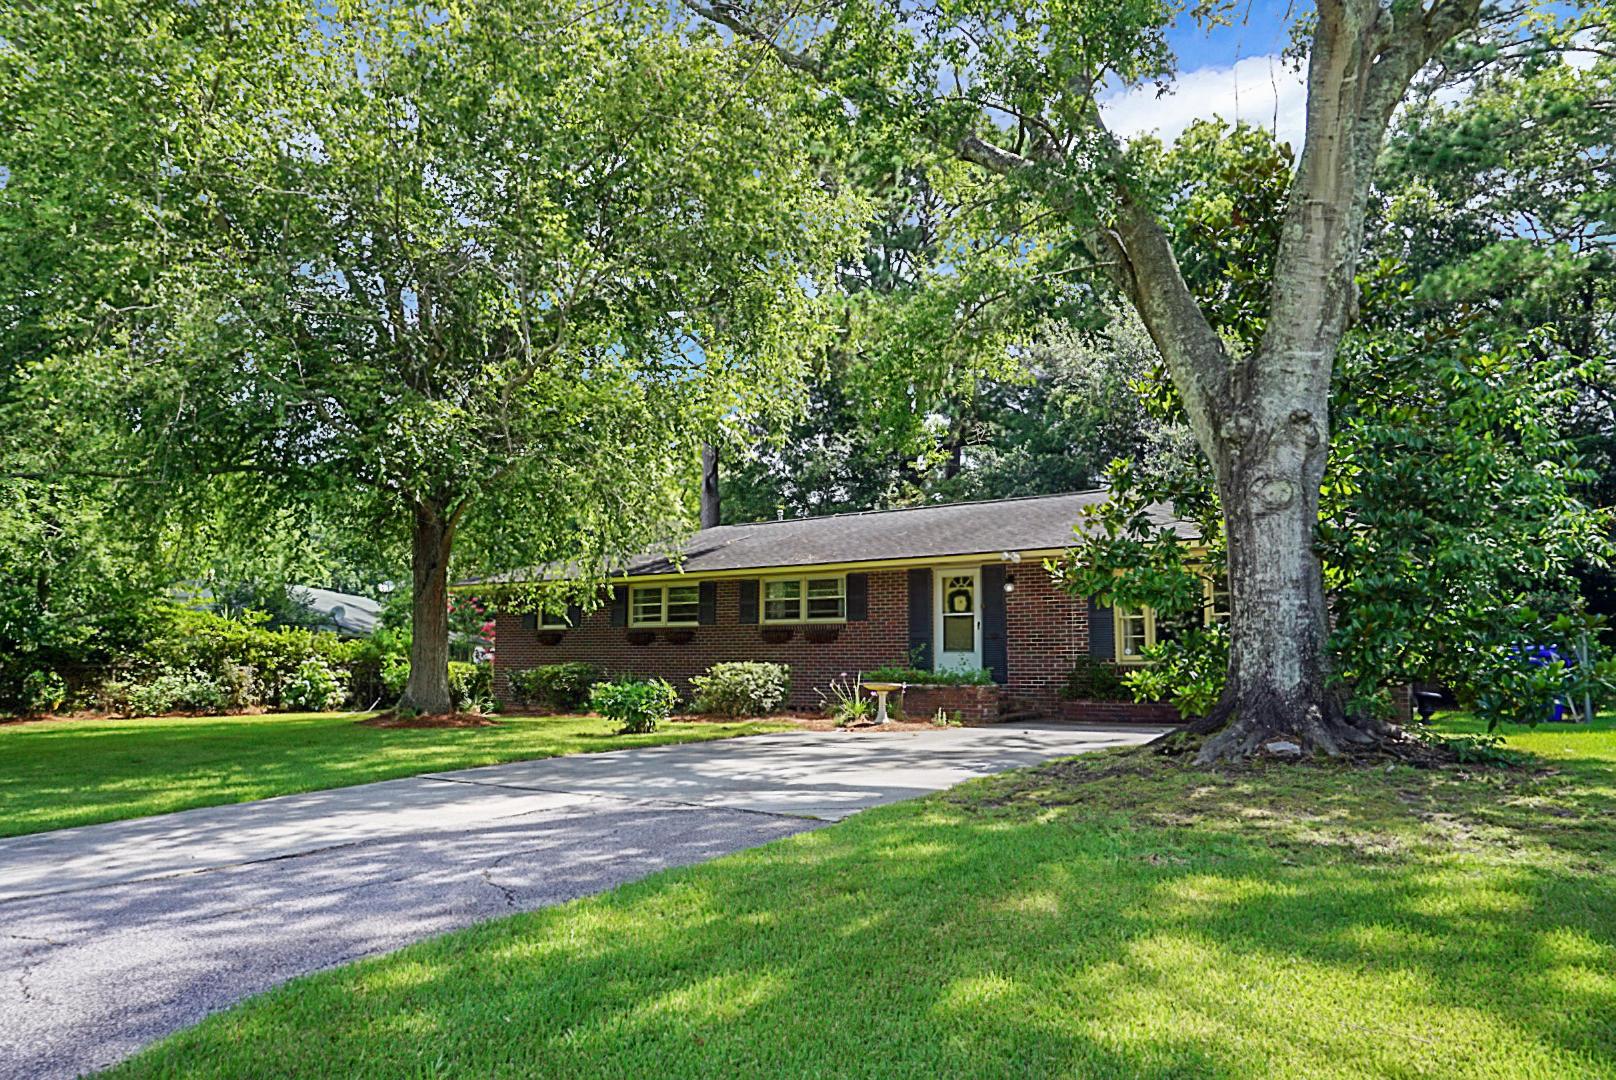 Oakland Homes For Sale - 408 Arlington, Charleston, SC - 13